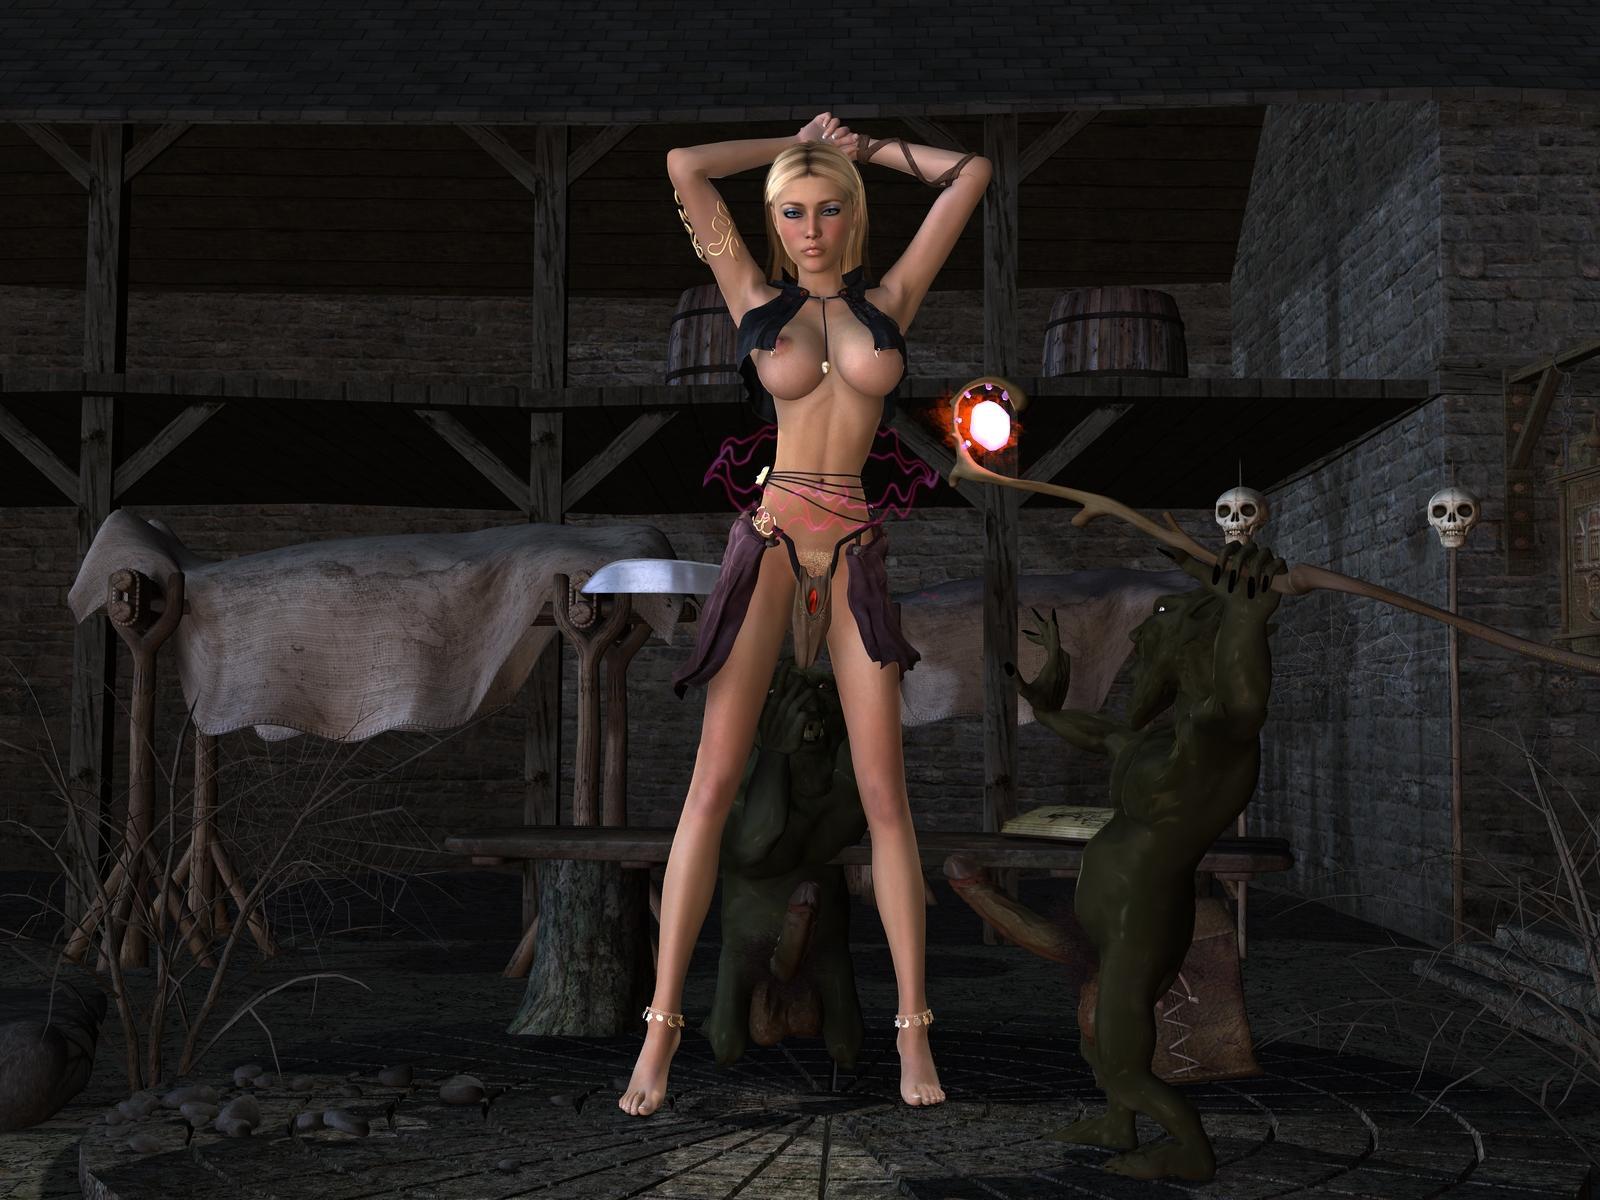 3d alien sex warrior movie porn scenes